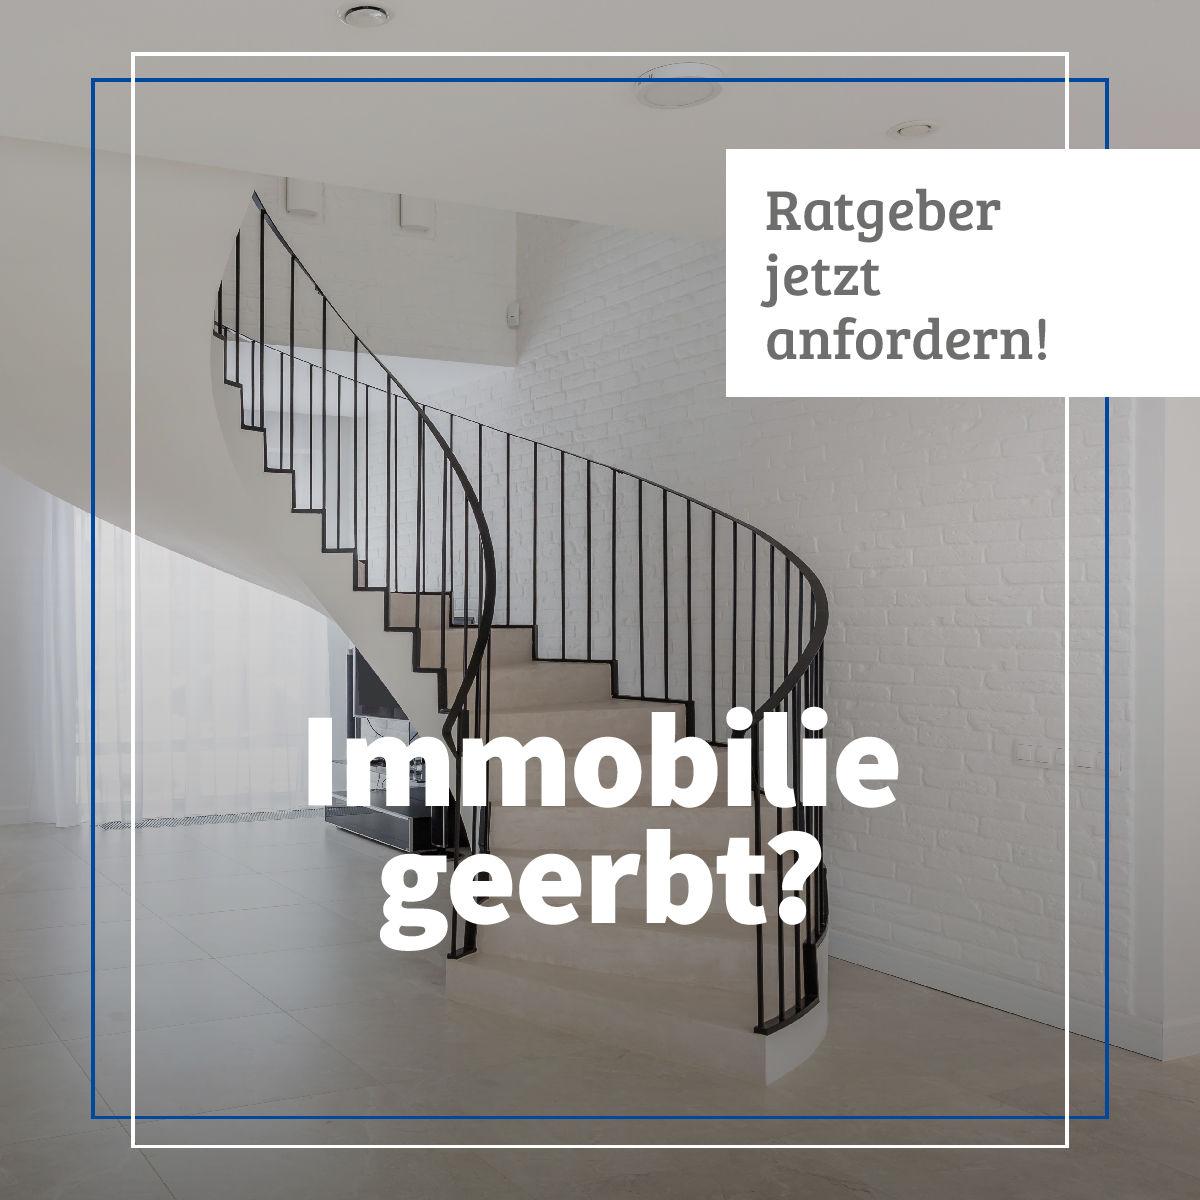 Mayer_und_Dau_Immobilie geerbt _Social_Media